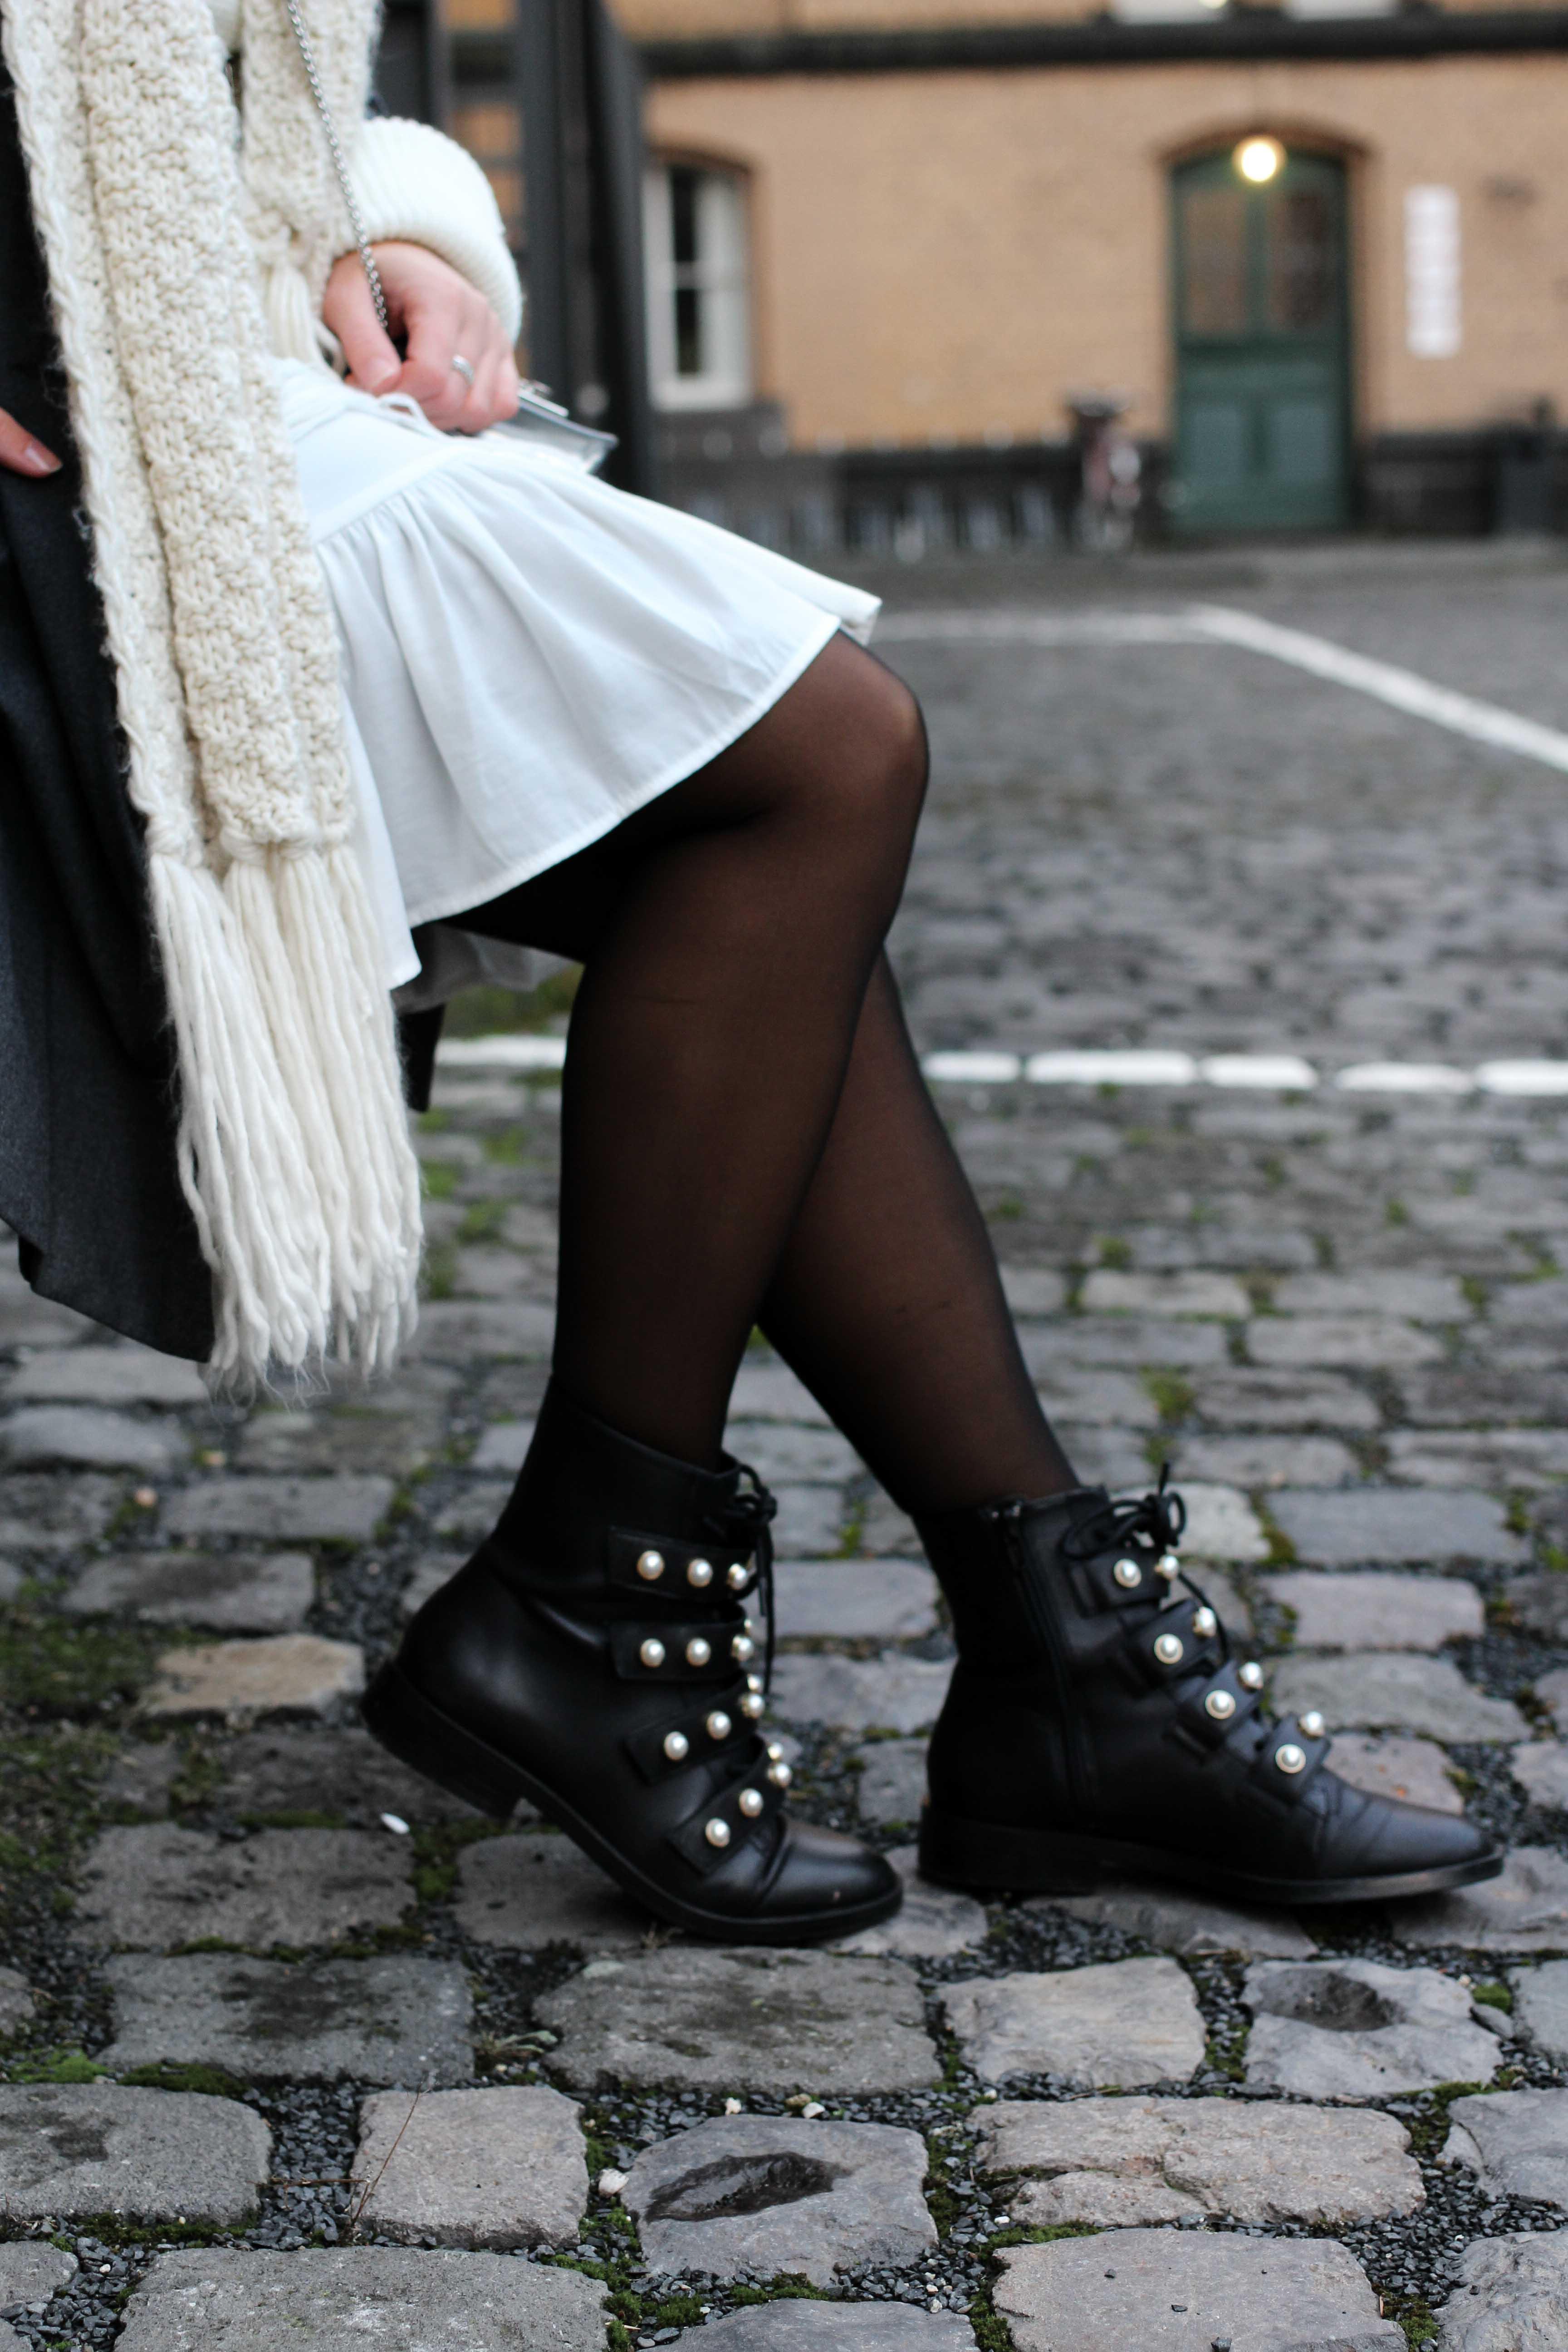 Winter-Layering weißes Kleid, Zara Boots Perlen schwarze Strumpfhose Hunkemöller kombinieren Outfit Modeblog bonn 8